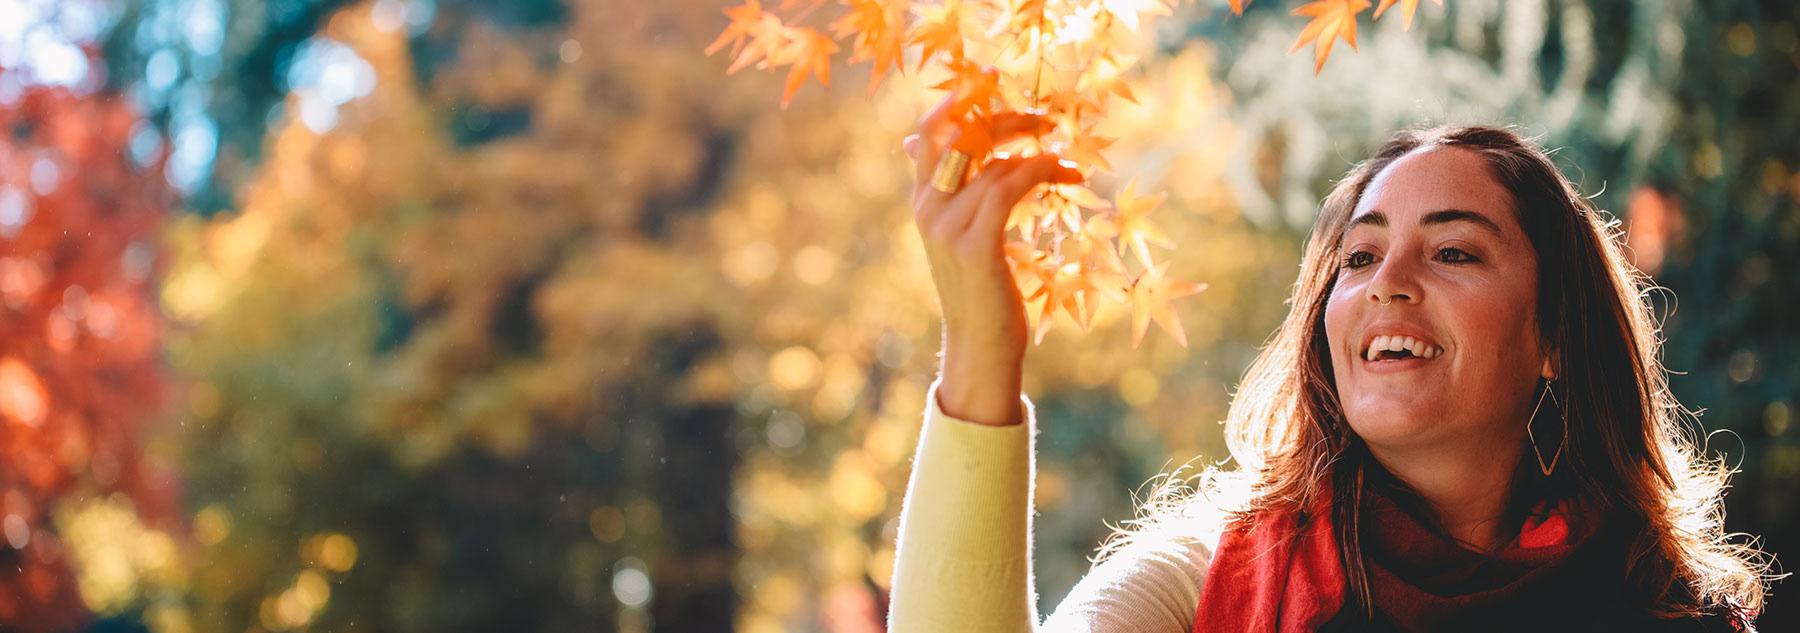 Fall Rejuvenation Guide